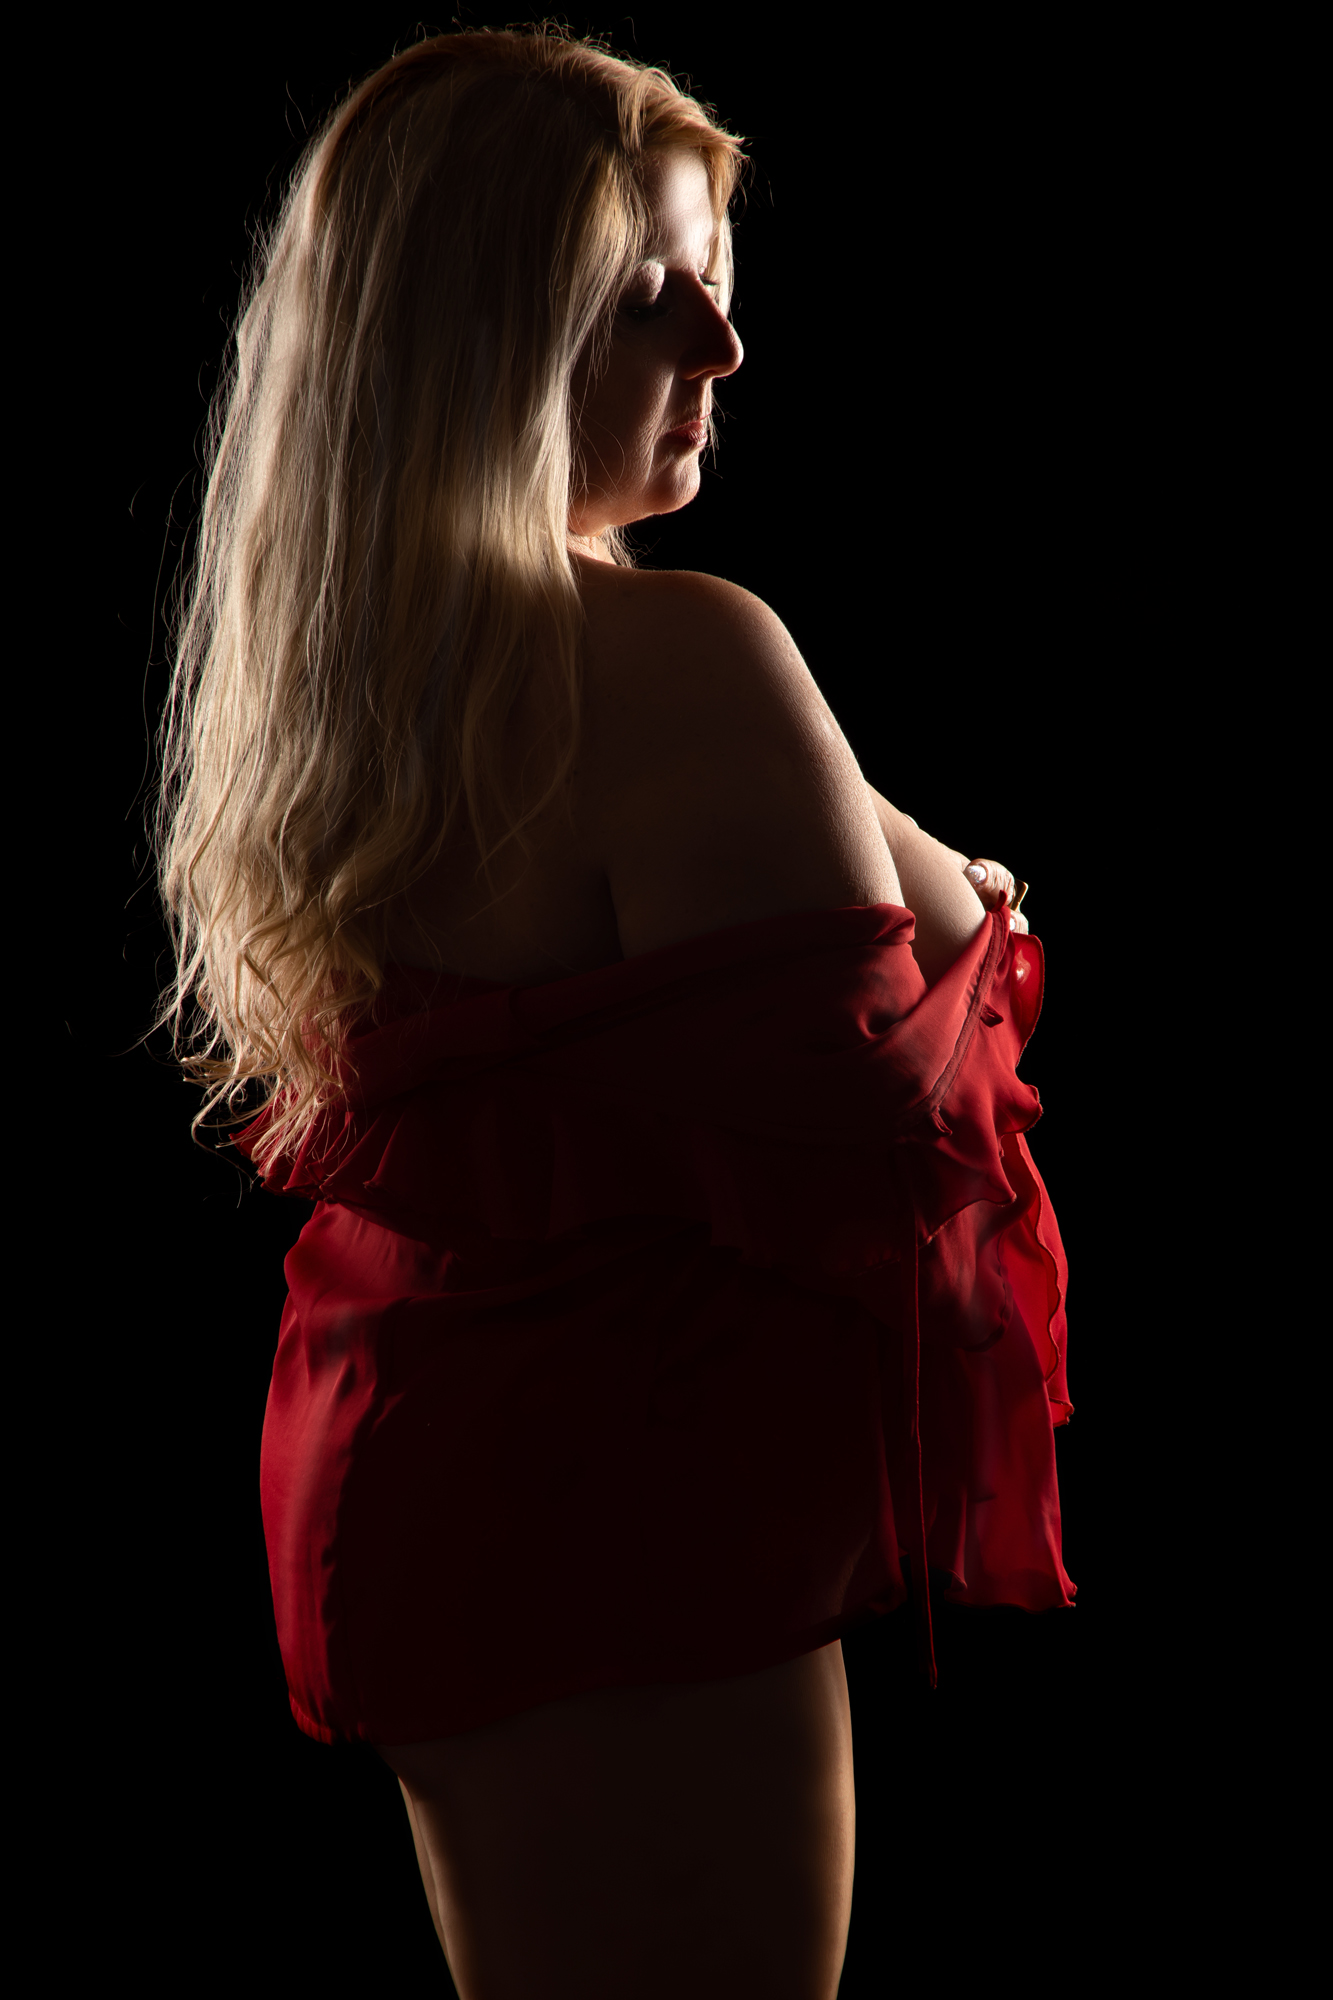 Erotik Fotoshooting Curvy Woman